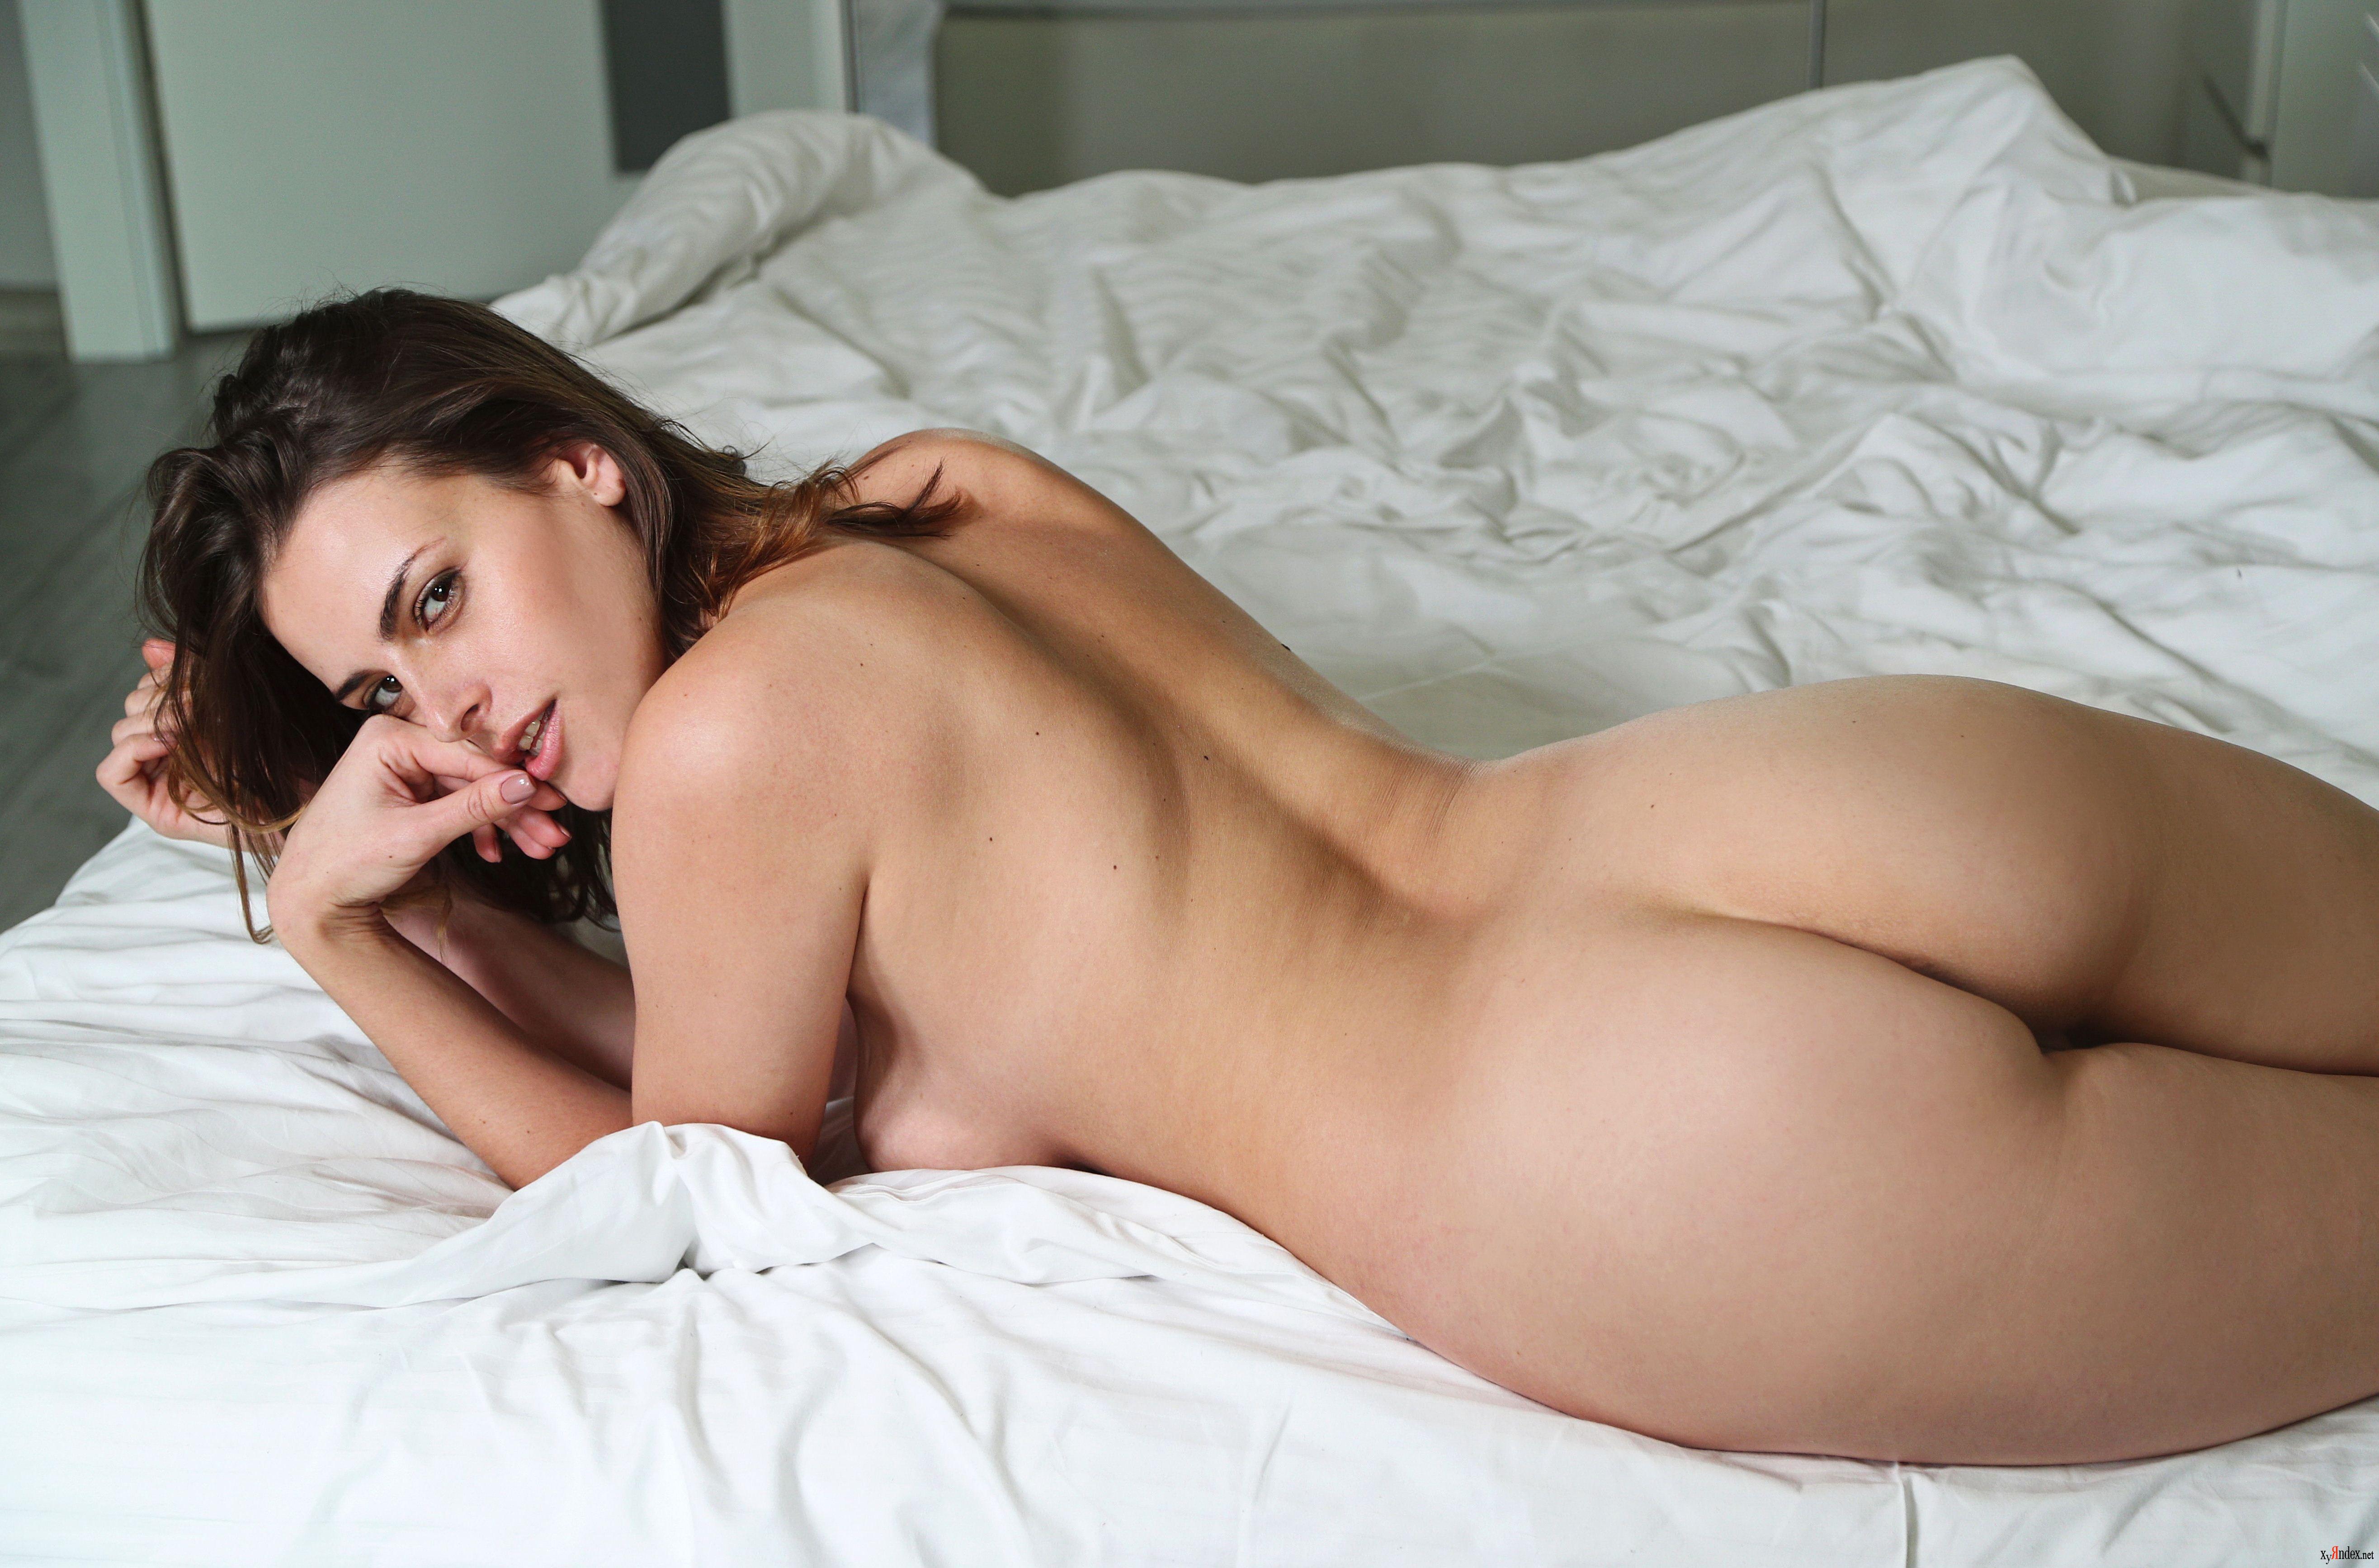 Metart evangelina wish chickies nude model busty buffy upskirt big boob shemale